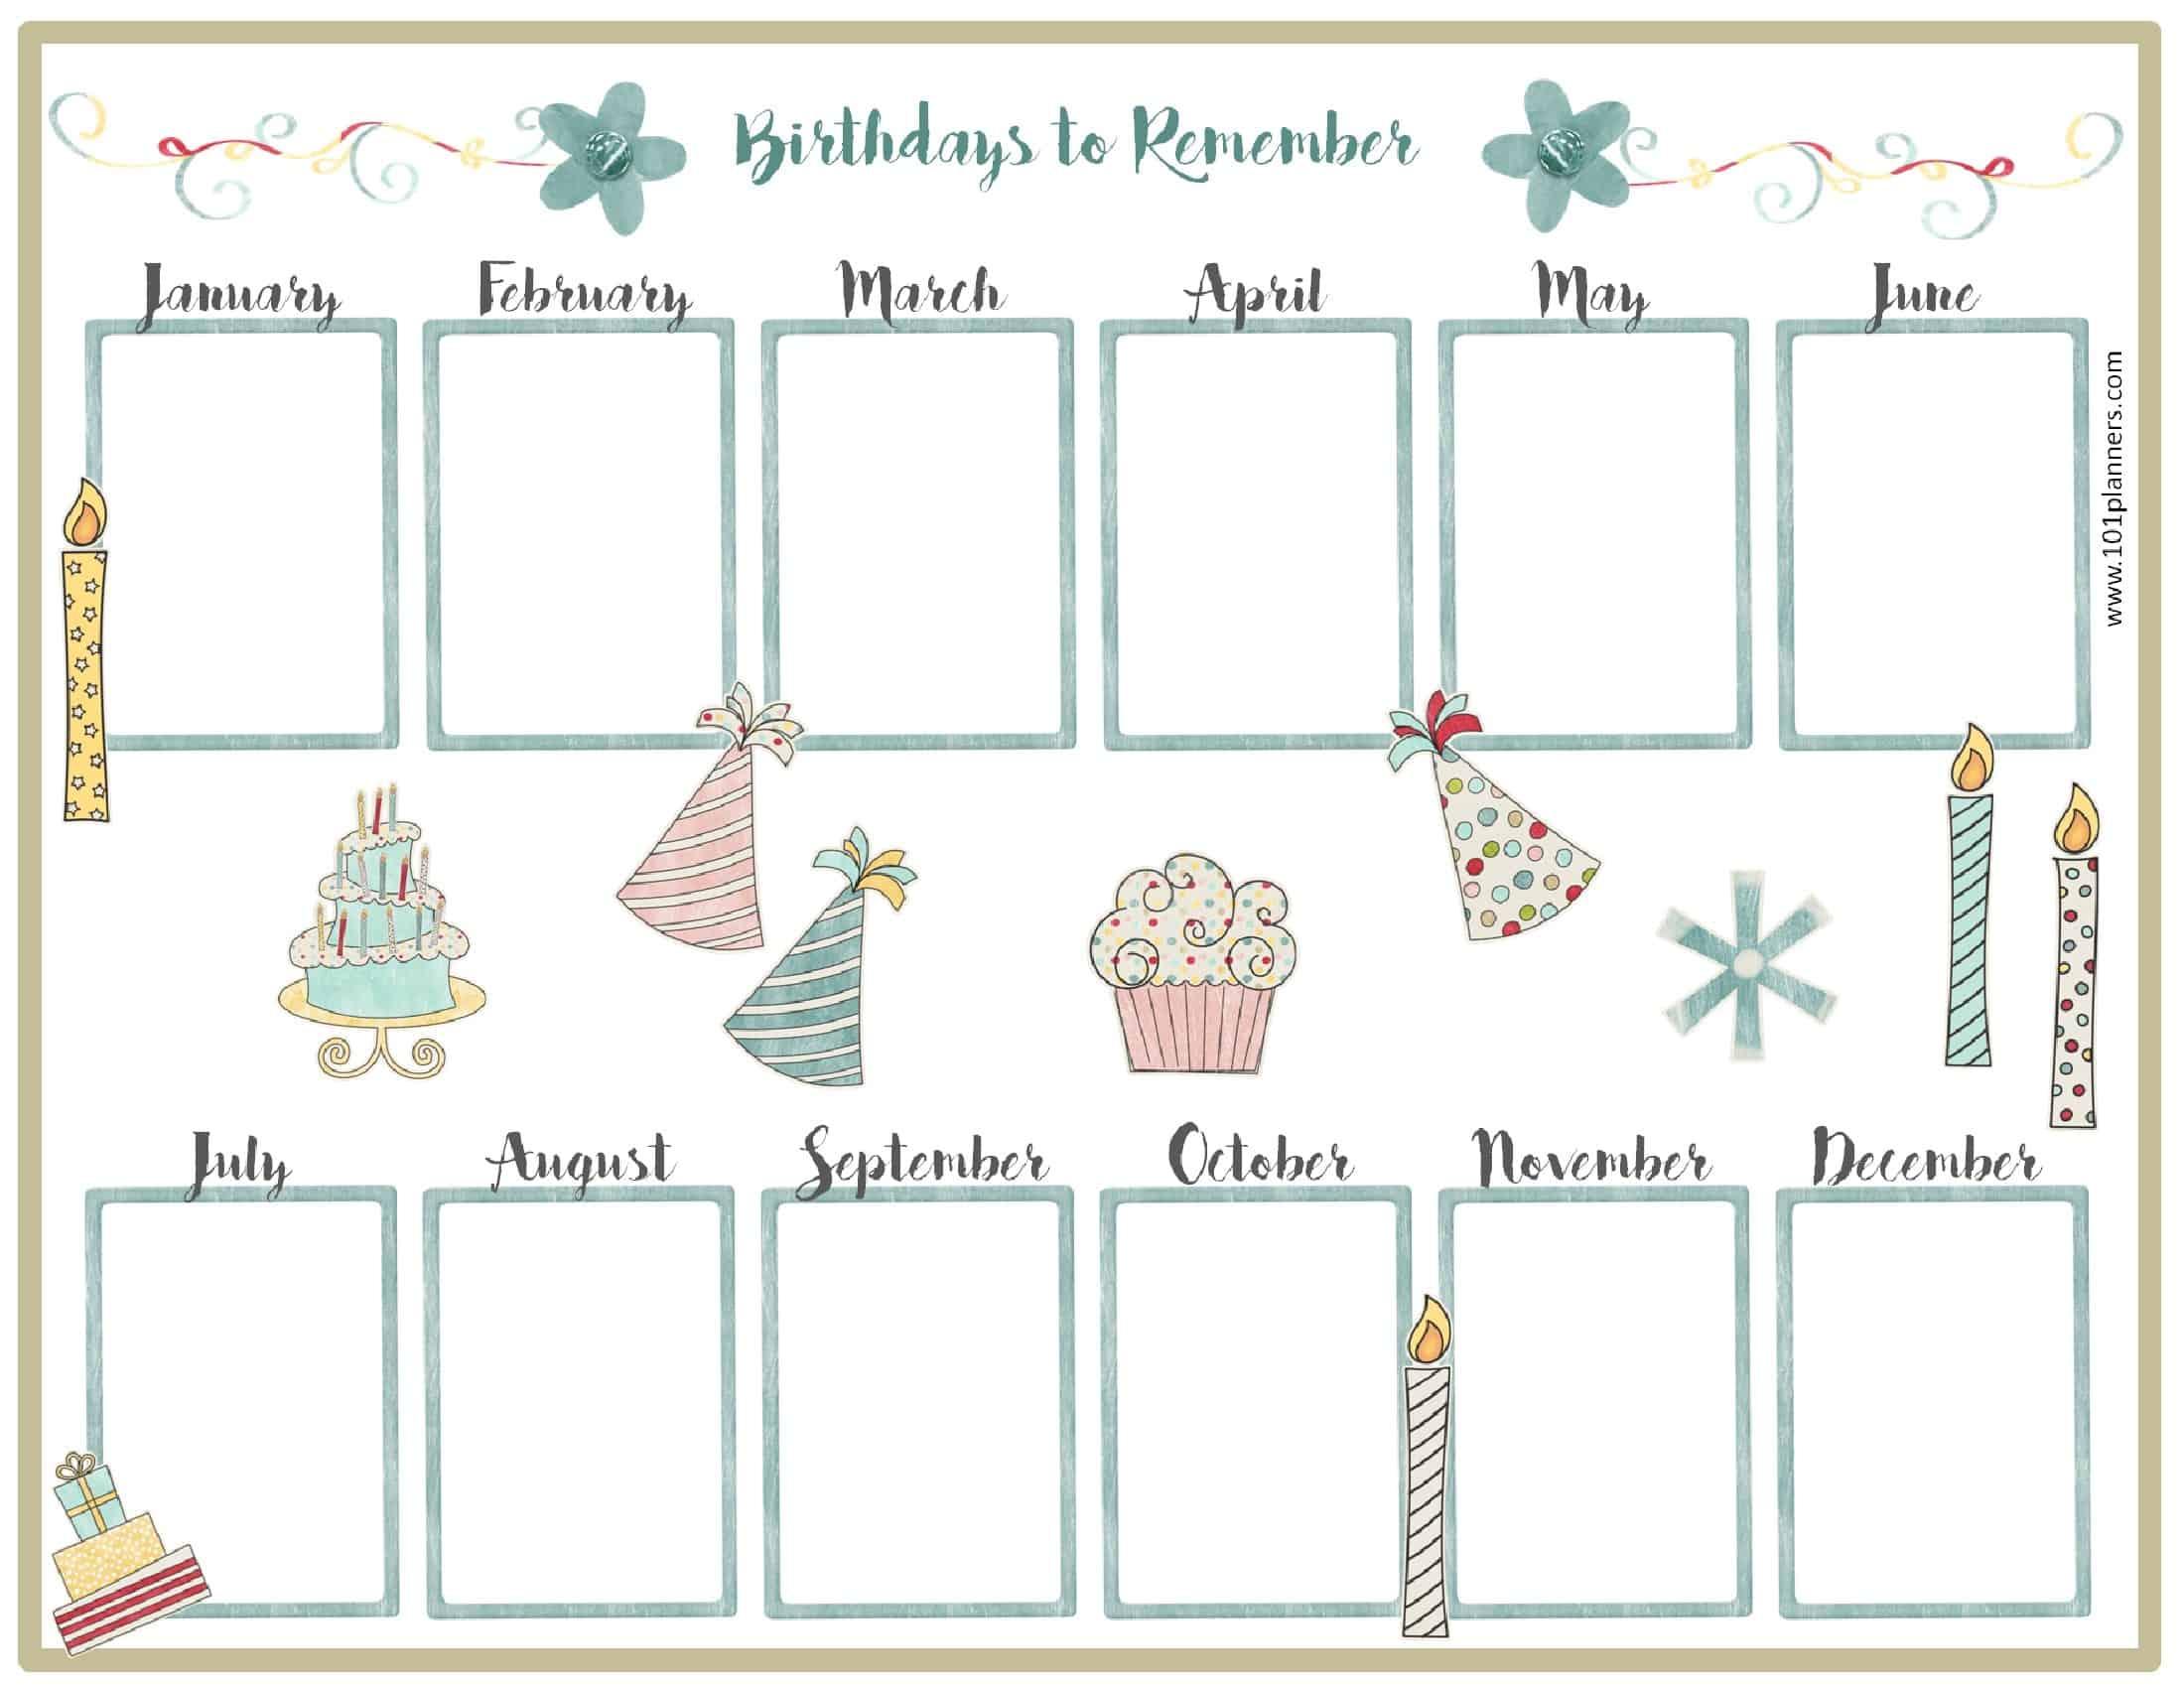 Birthday Calendar Template Free Microsoft Word intended for Monthly Birthday Calendar Template